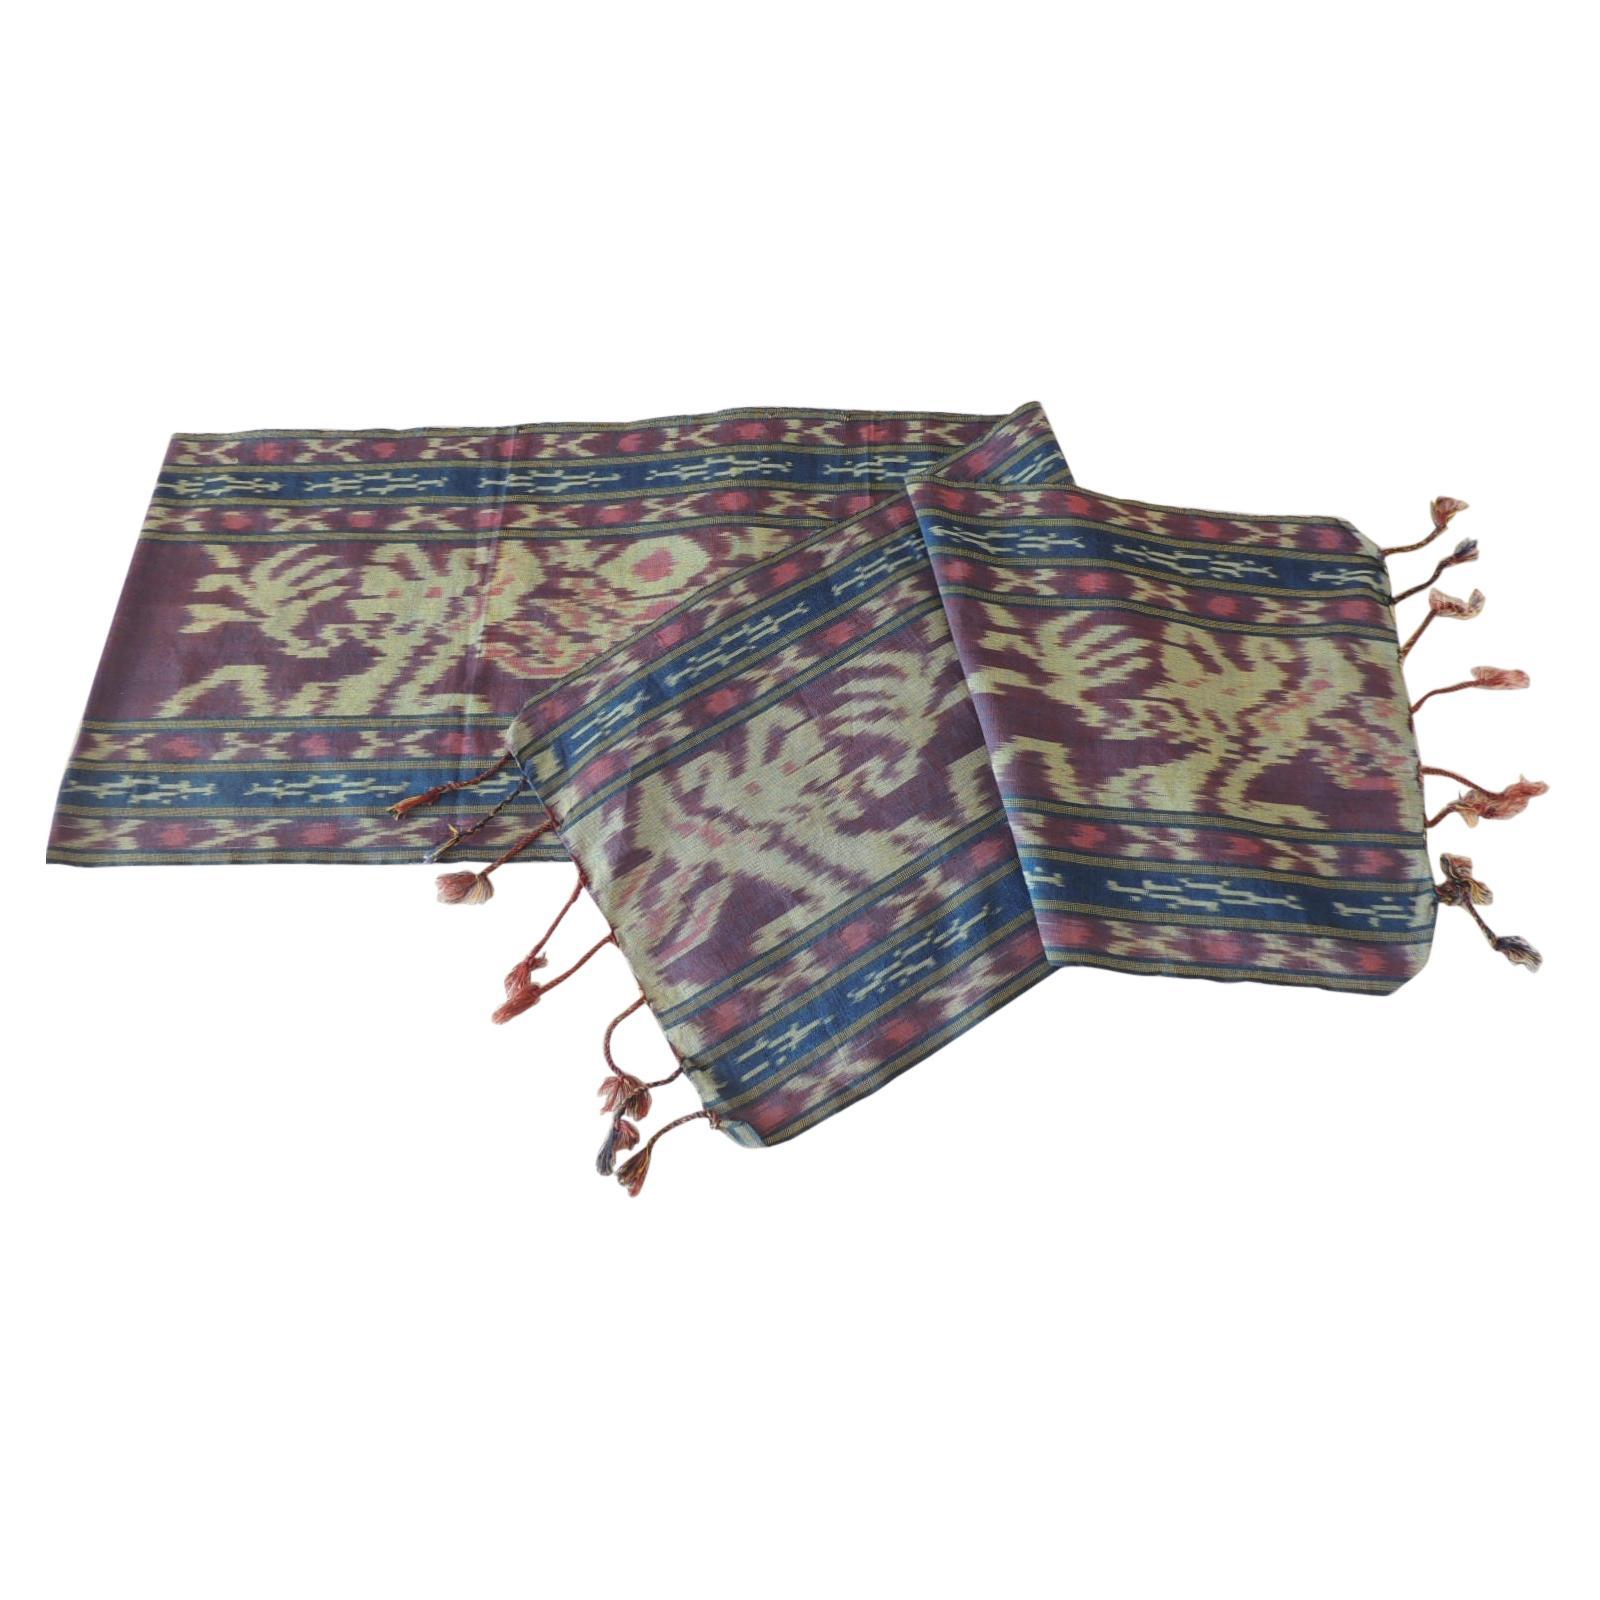 Purple and Blue Ikat Sash Textile Panel